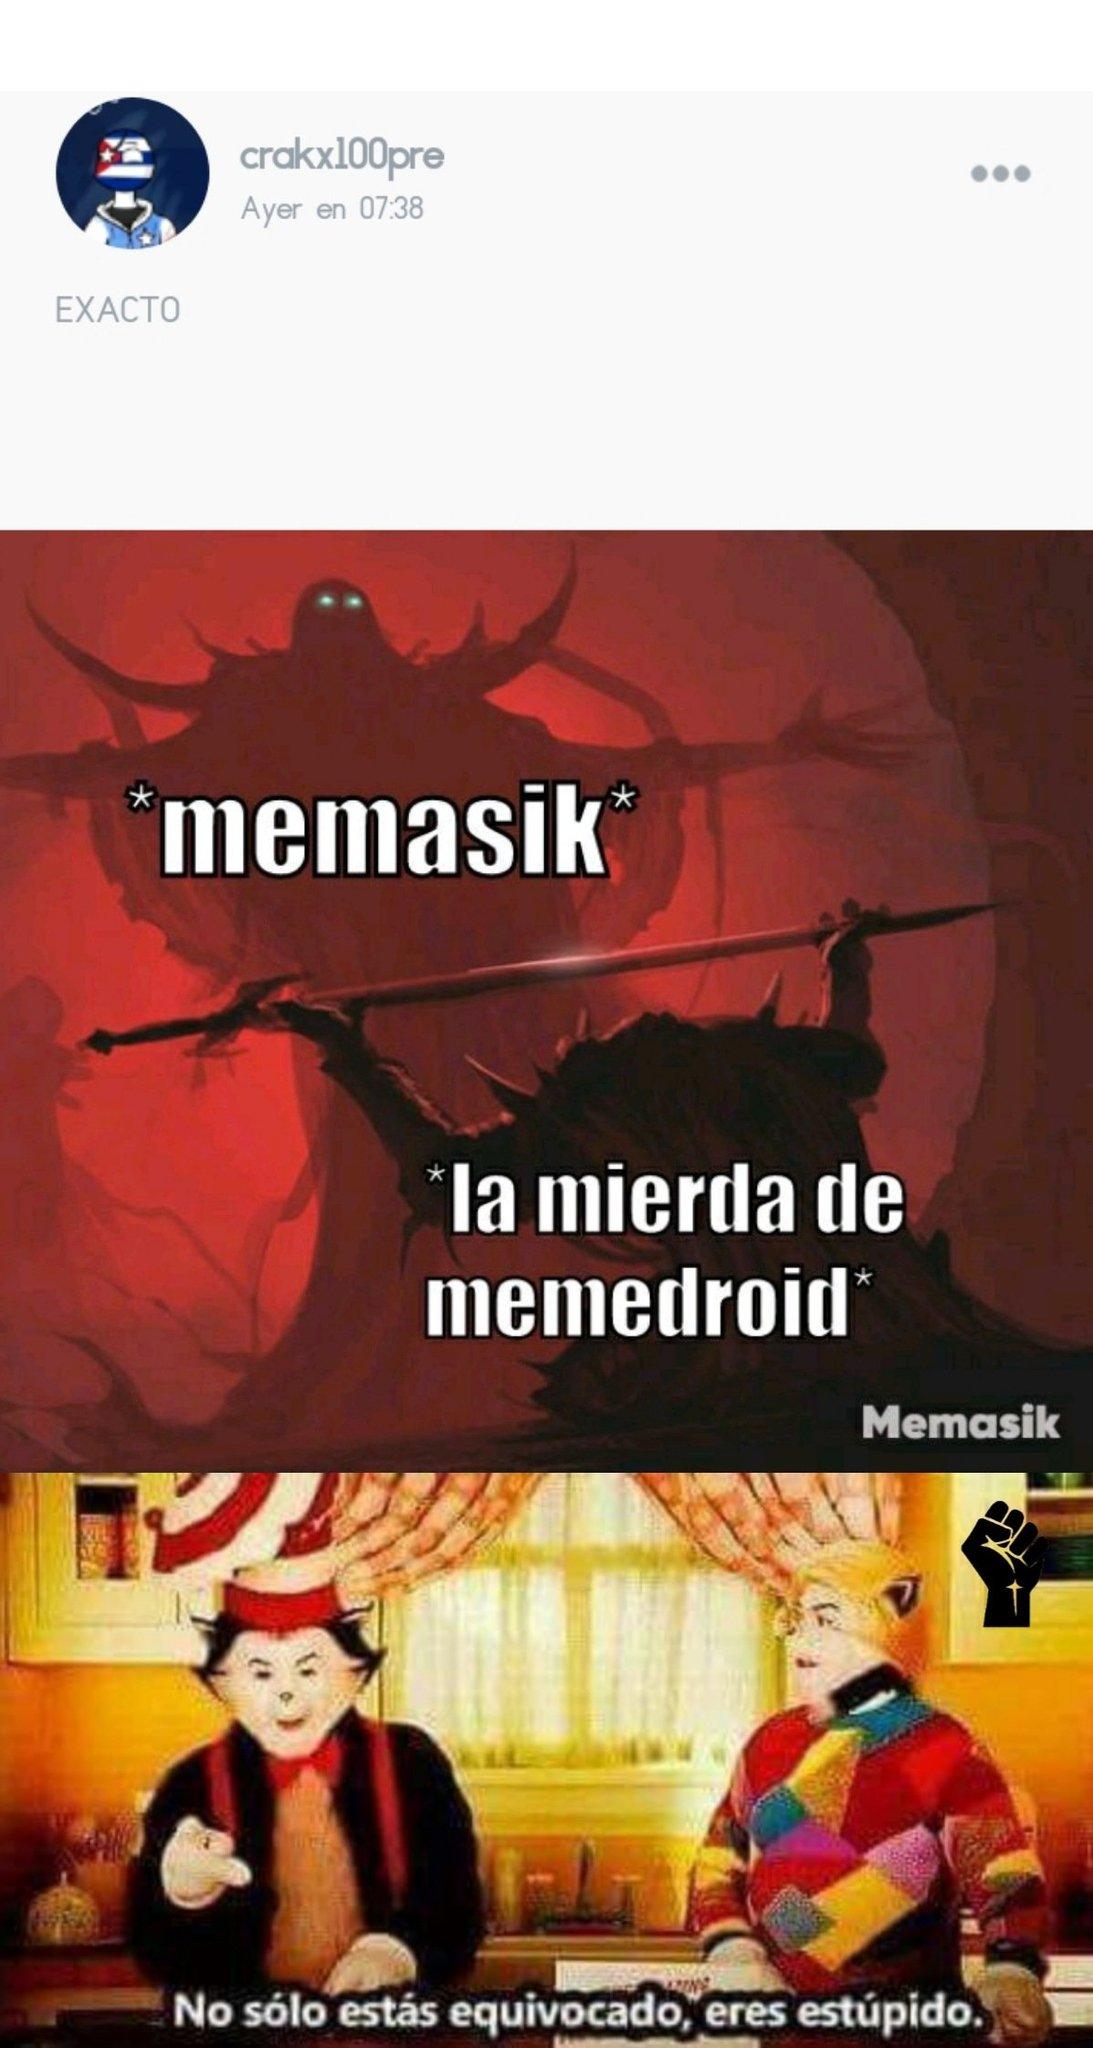 Pensé que memasik no era tan malo, pero casi no paro de vomitar - meme